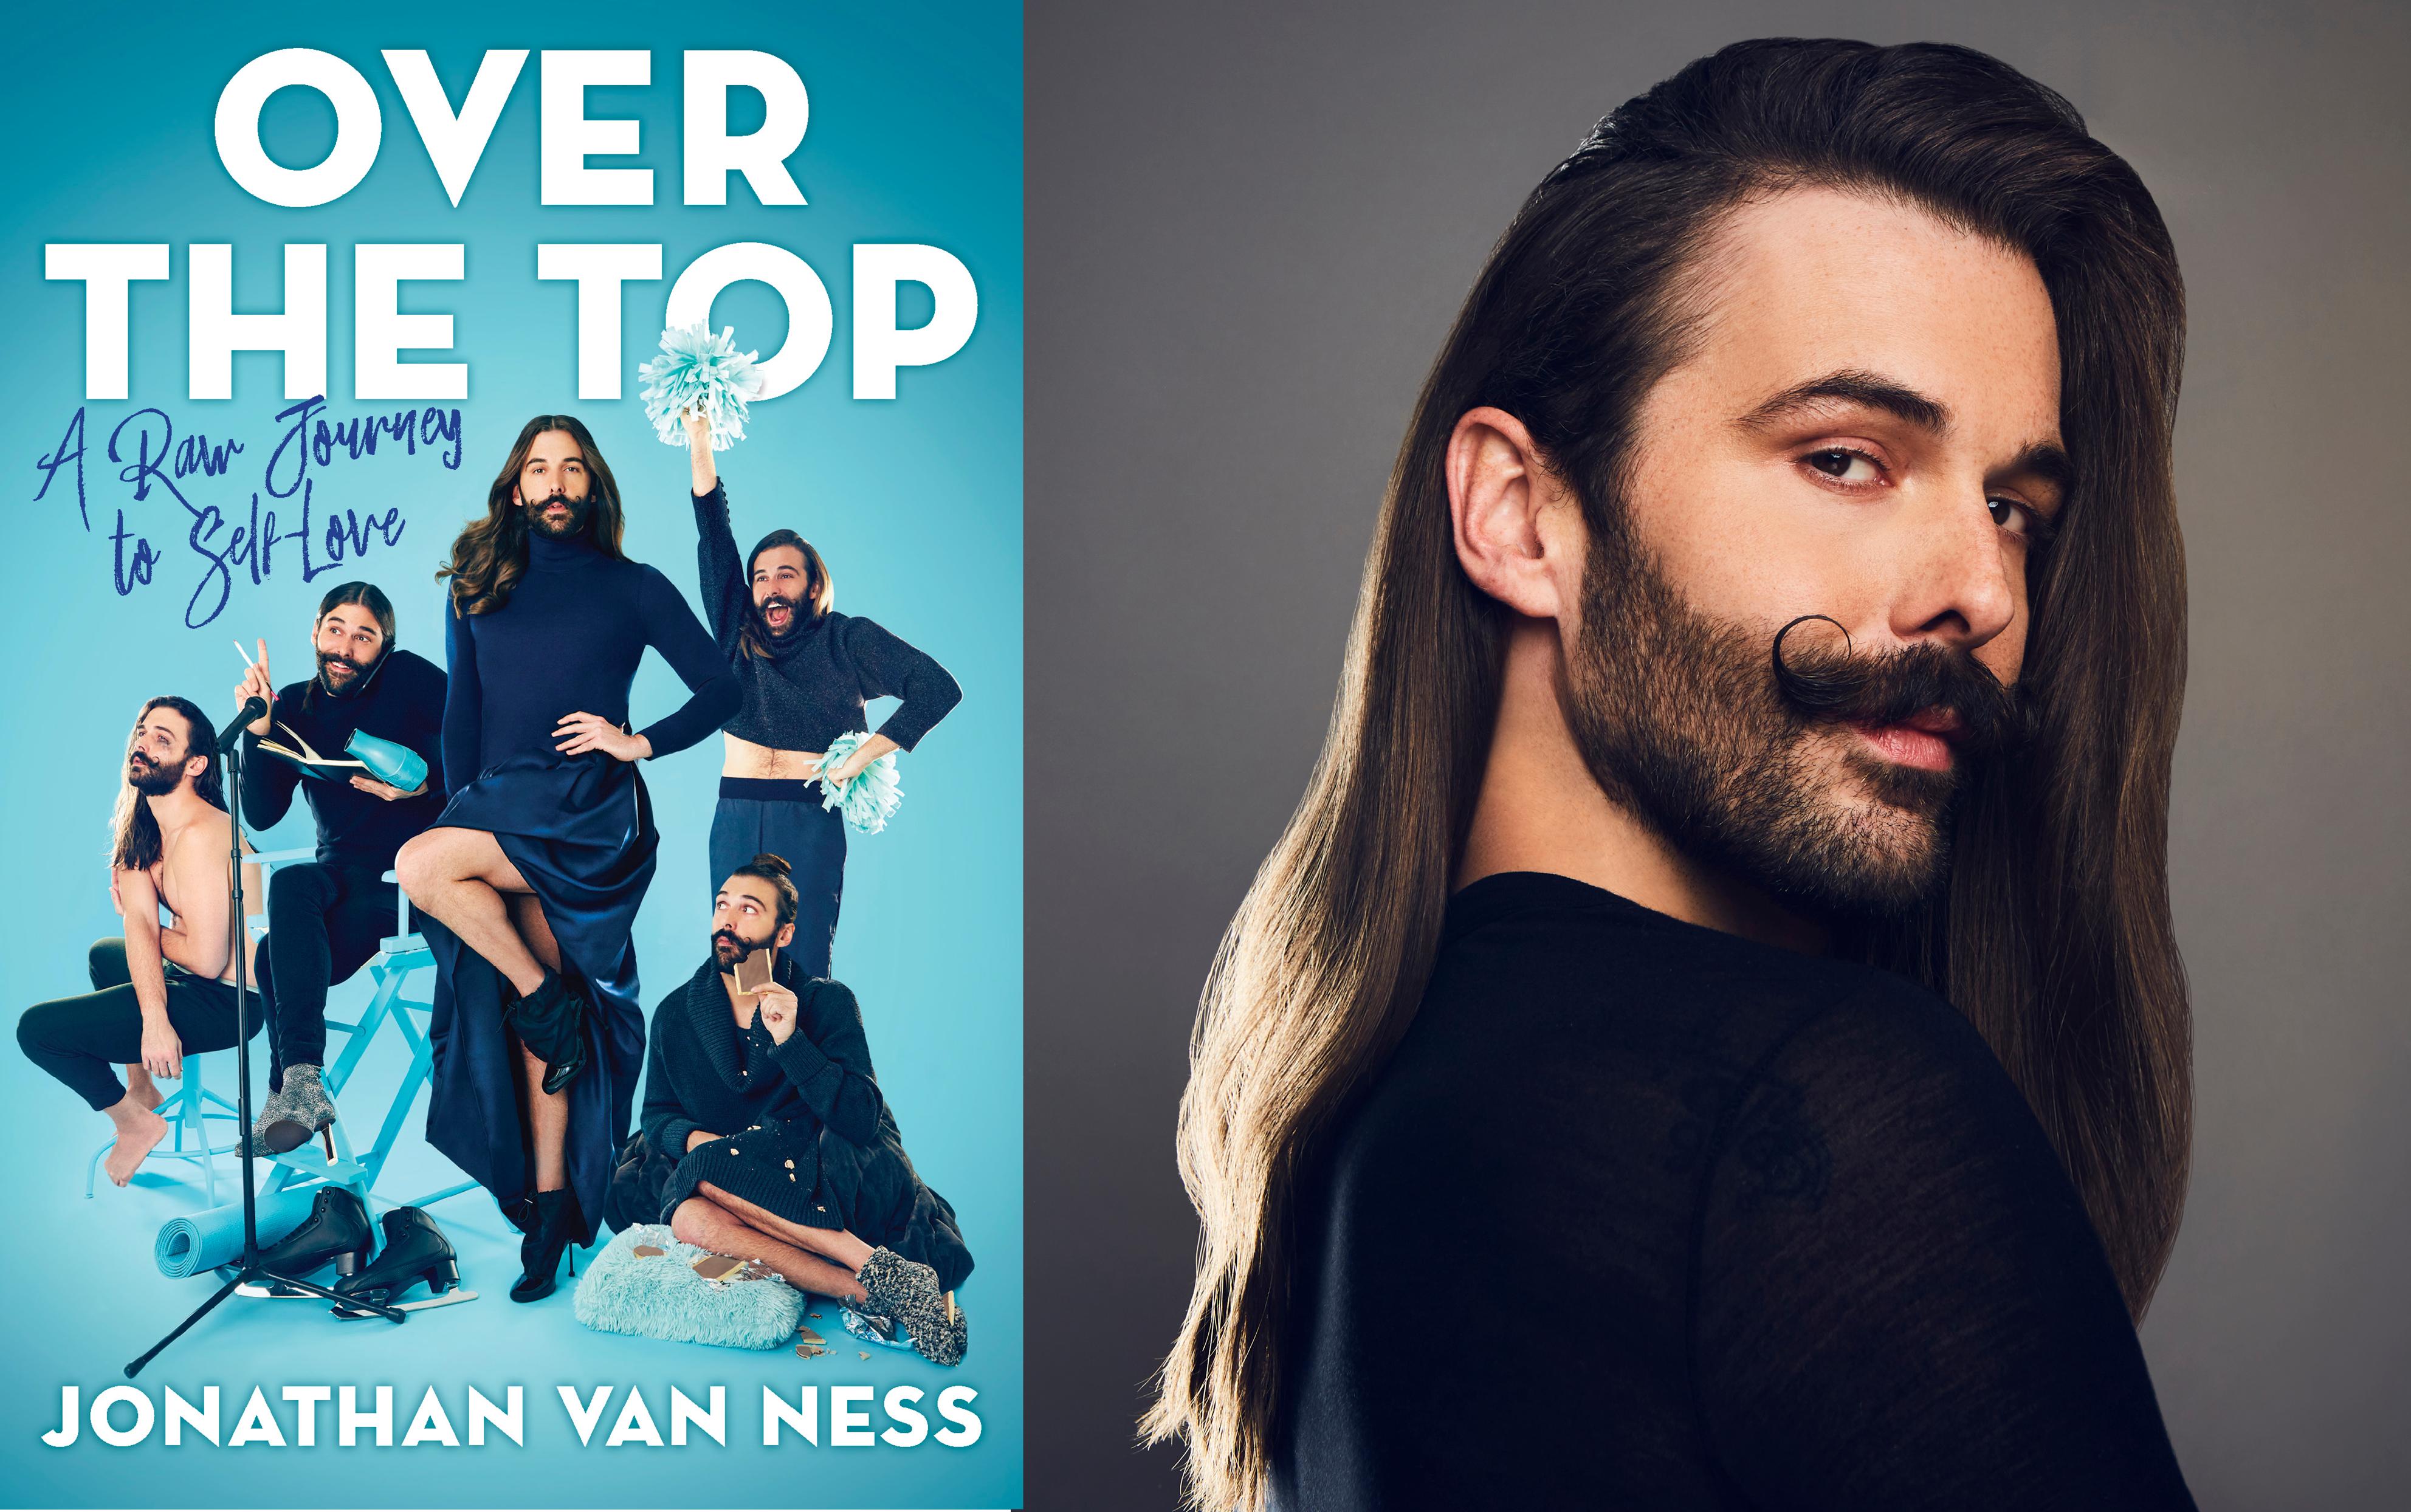 Jonathan Van Ness: Over the Top